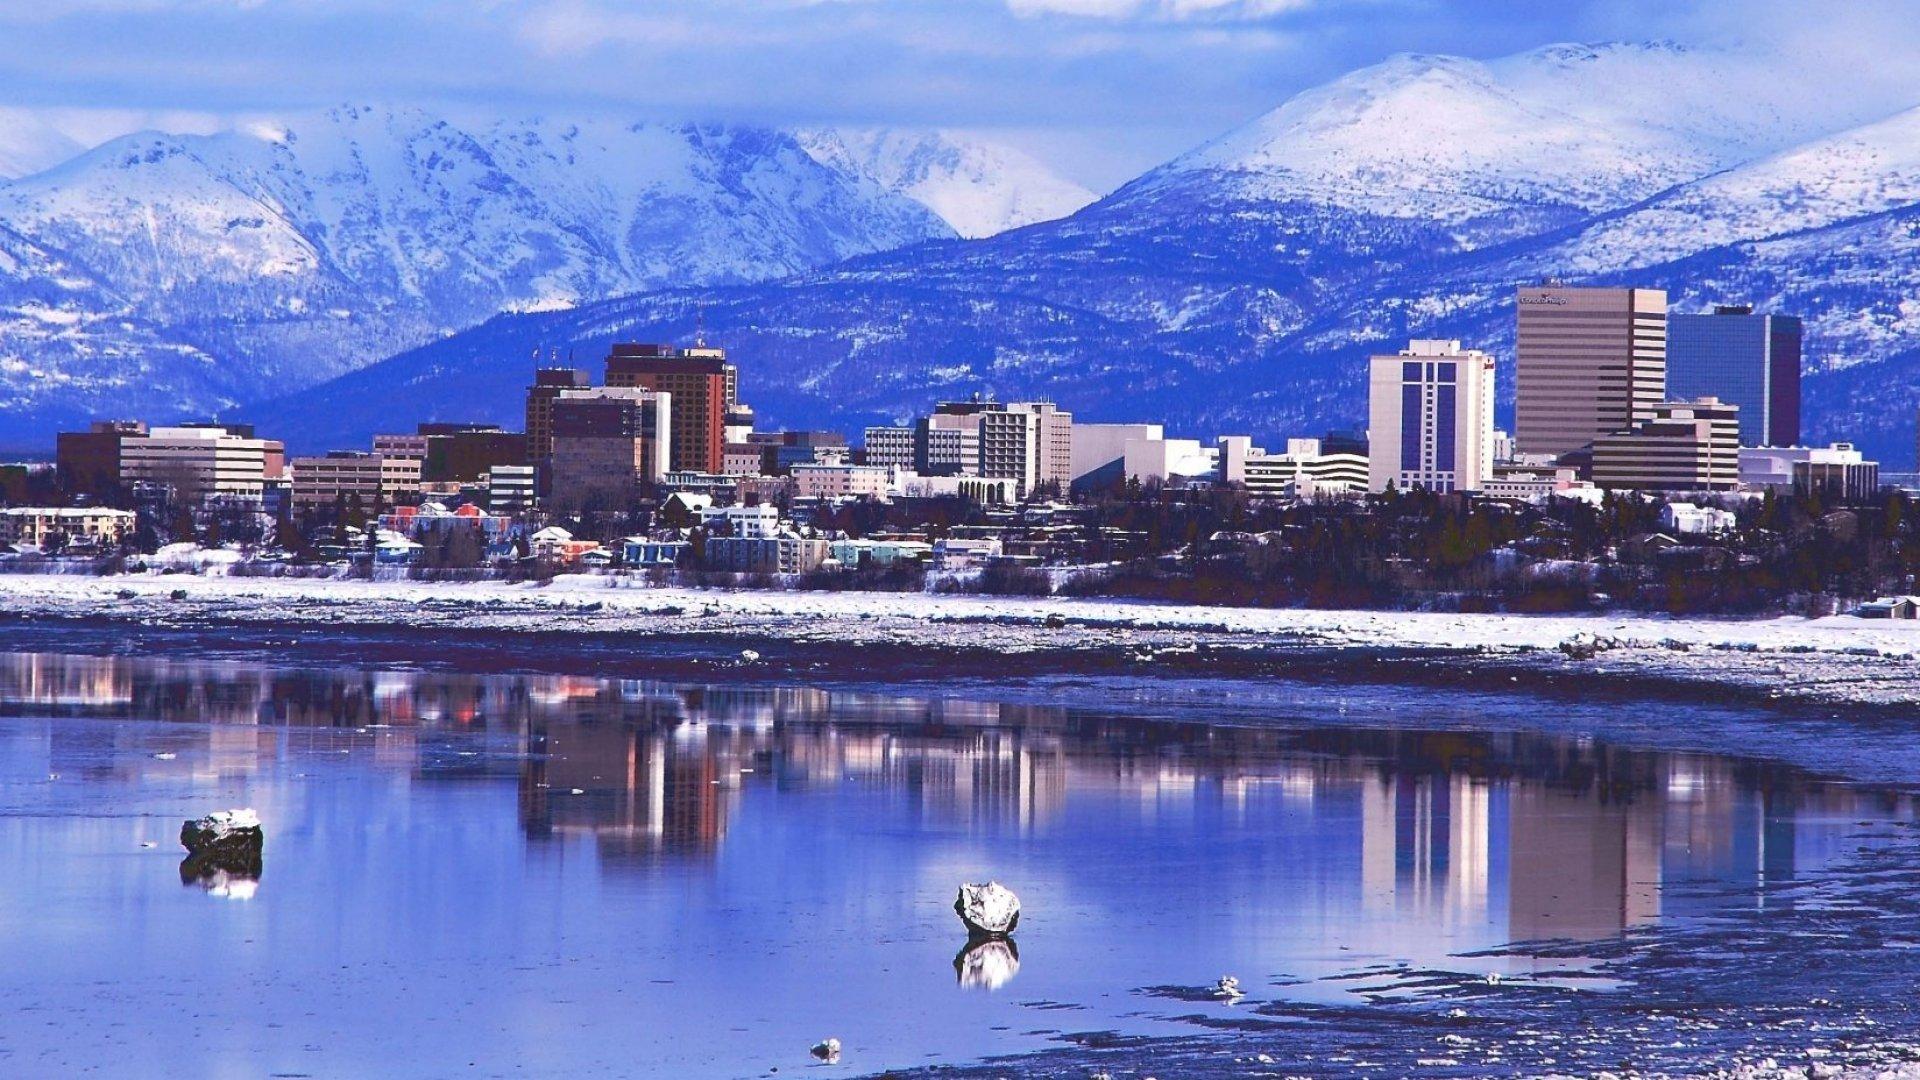 A Billionaire's Wife. An $852,752 Napkin. The Short, Strange Story of Alaska Dispatch News